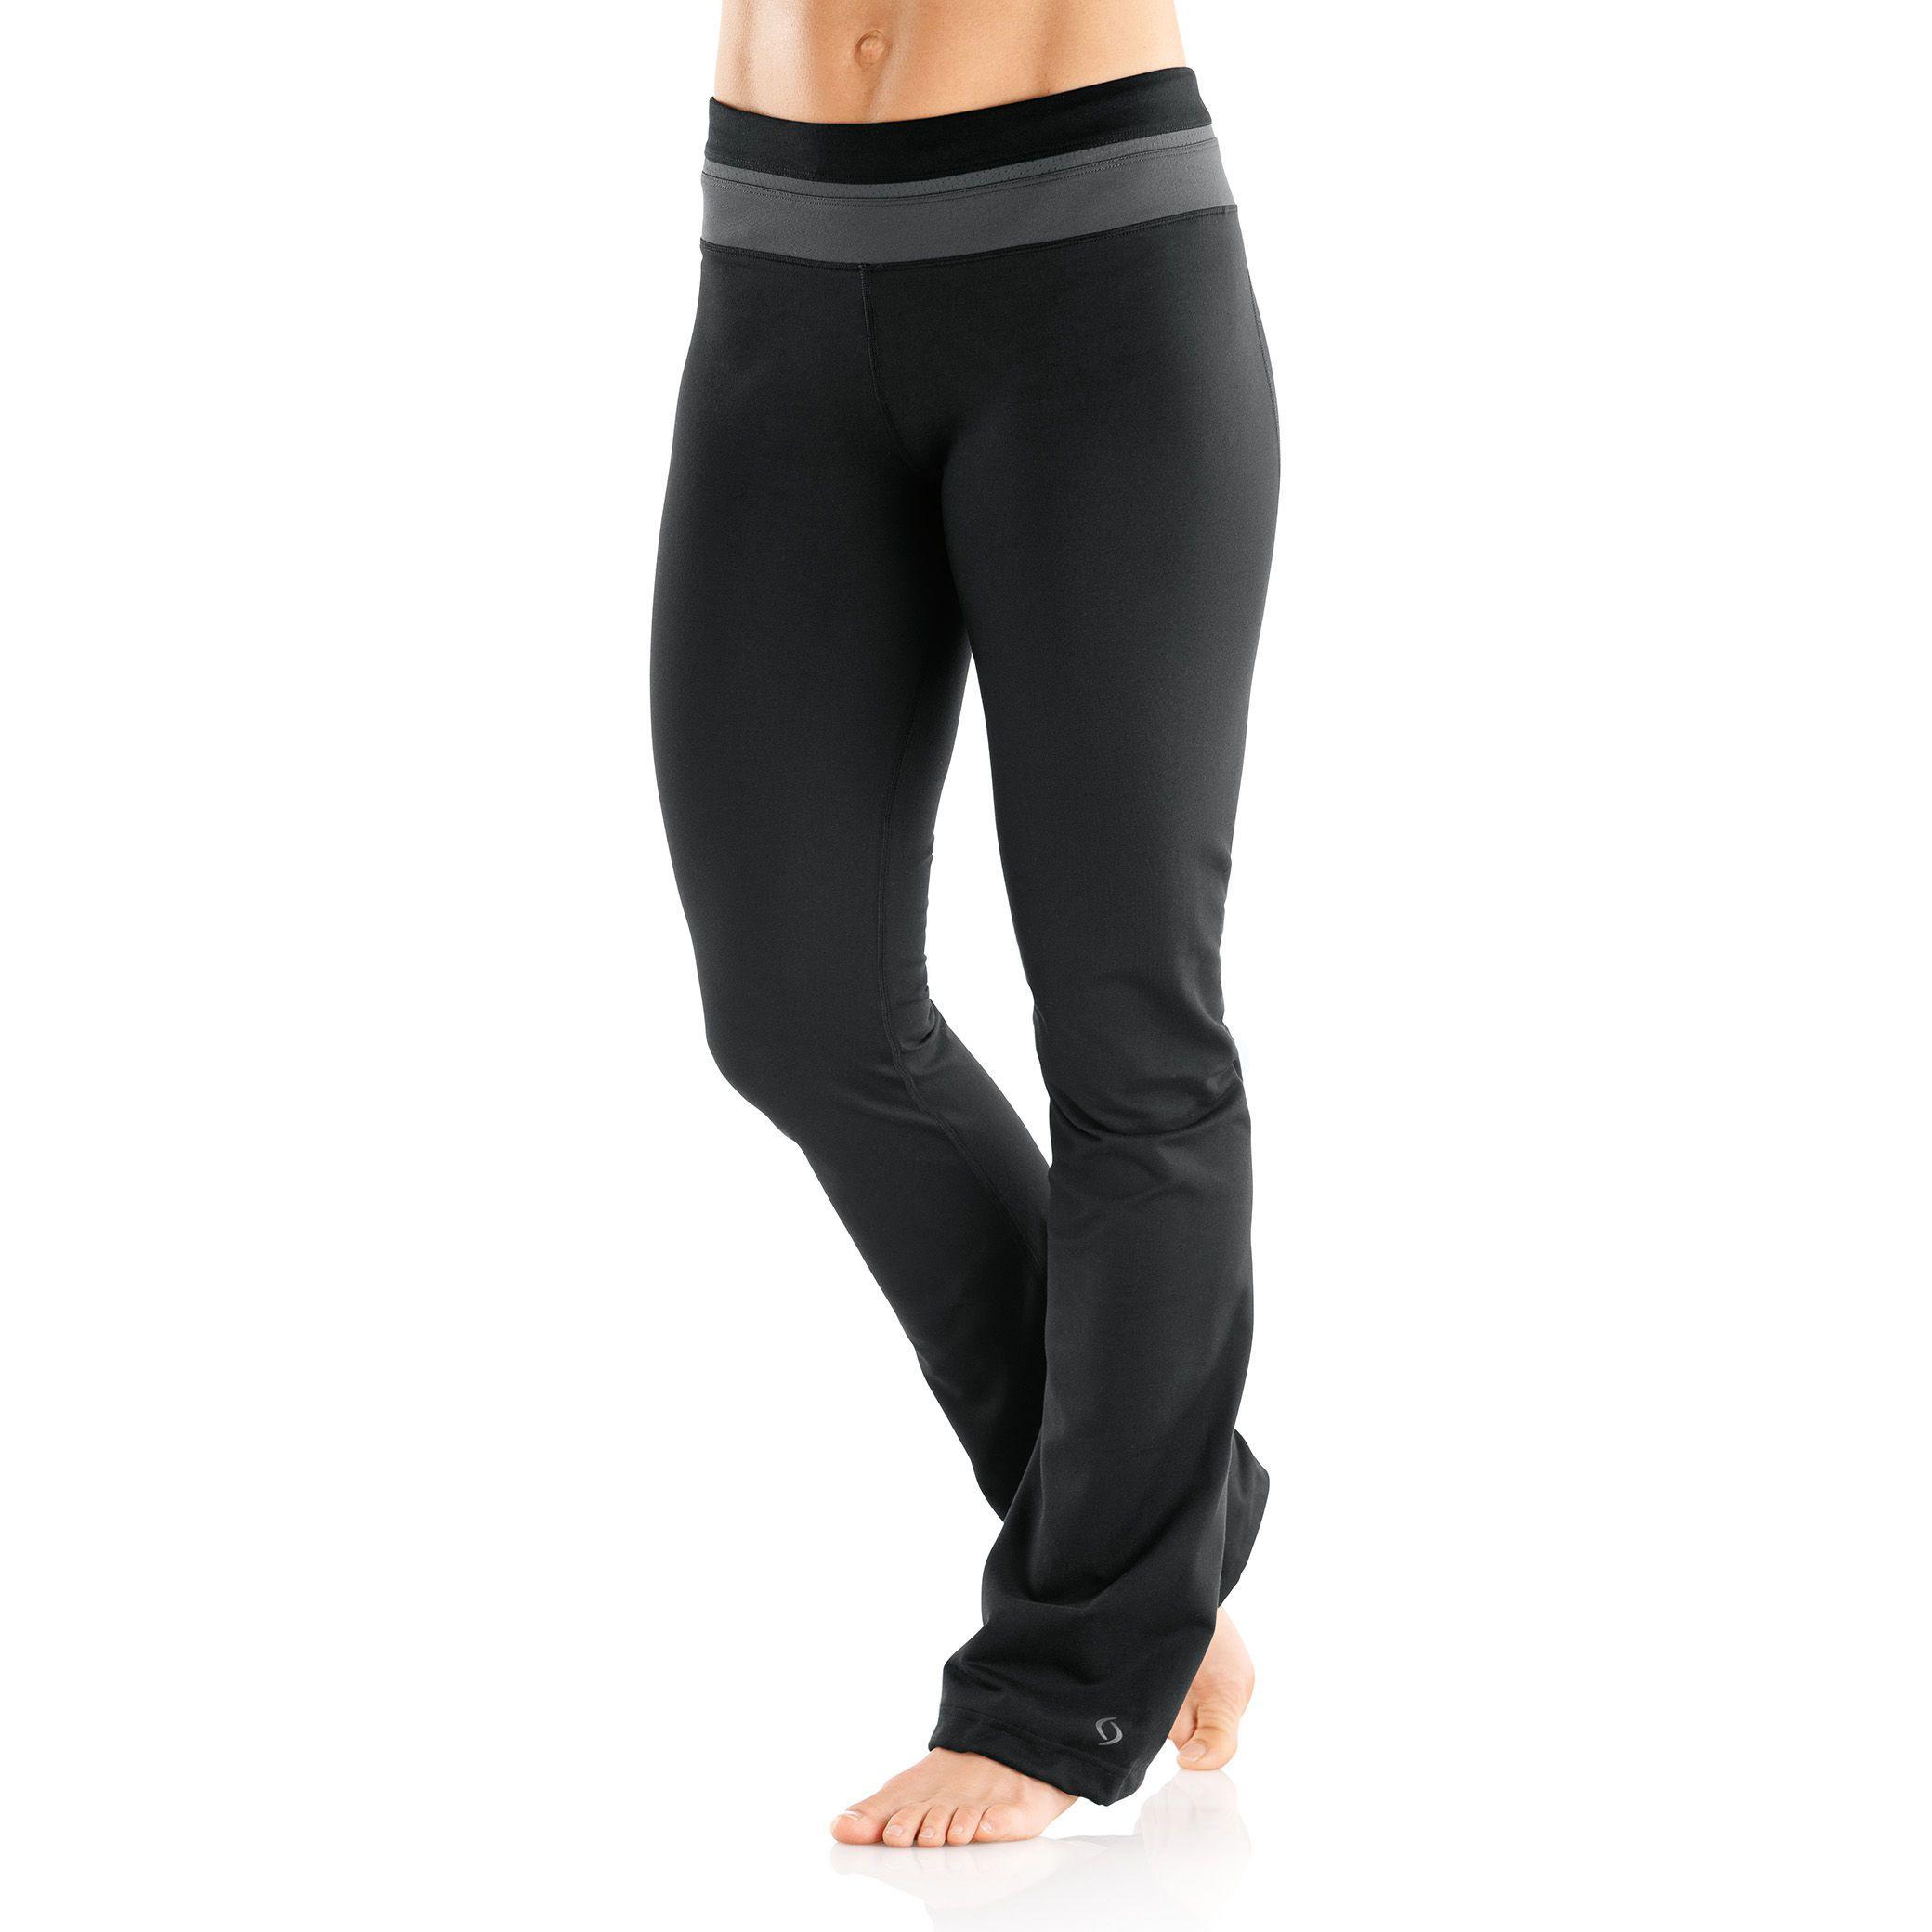 women fineform for comfort medium pants comforter a impact bra sports p save moving